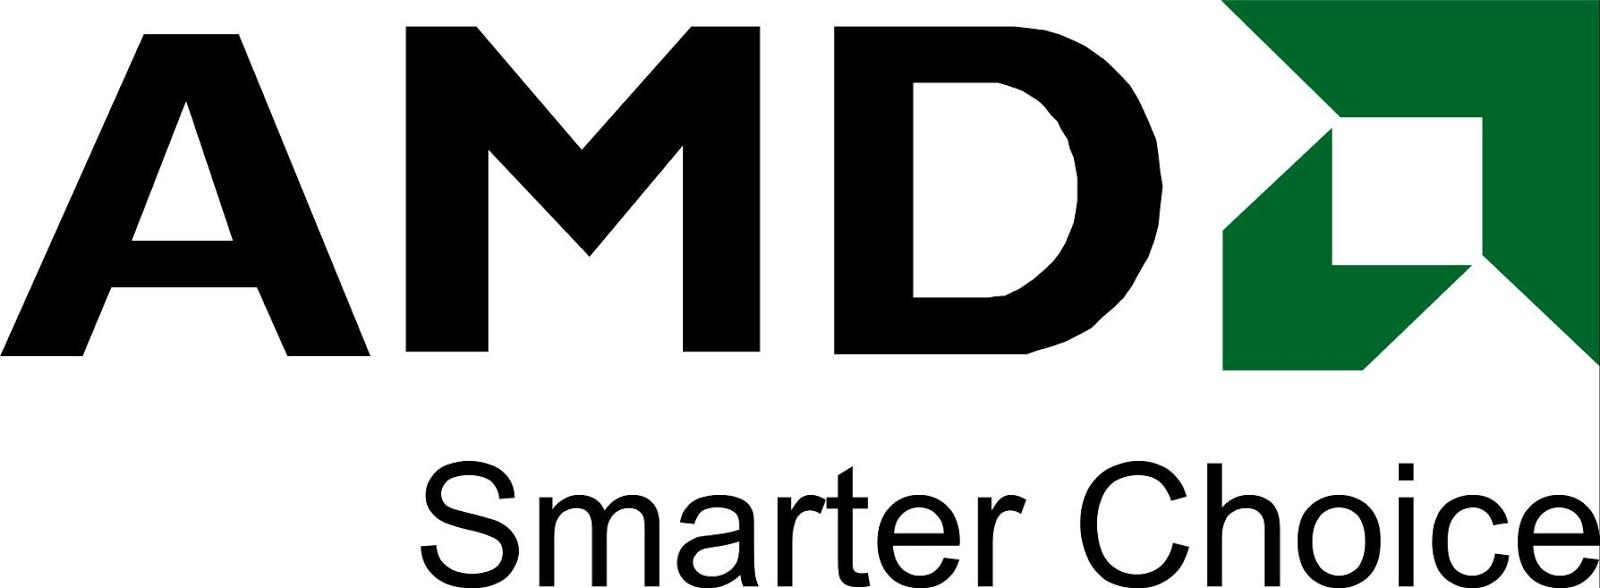 AMD brand wallpapers HD